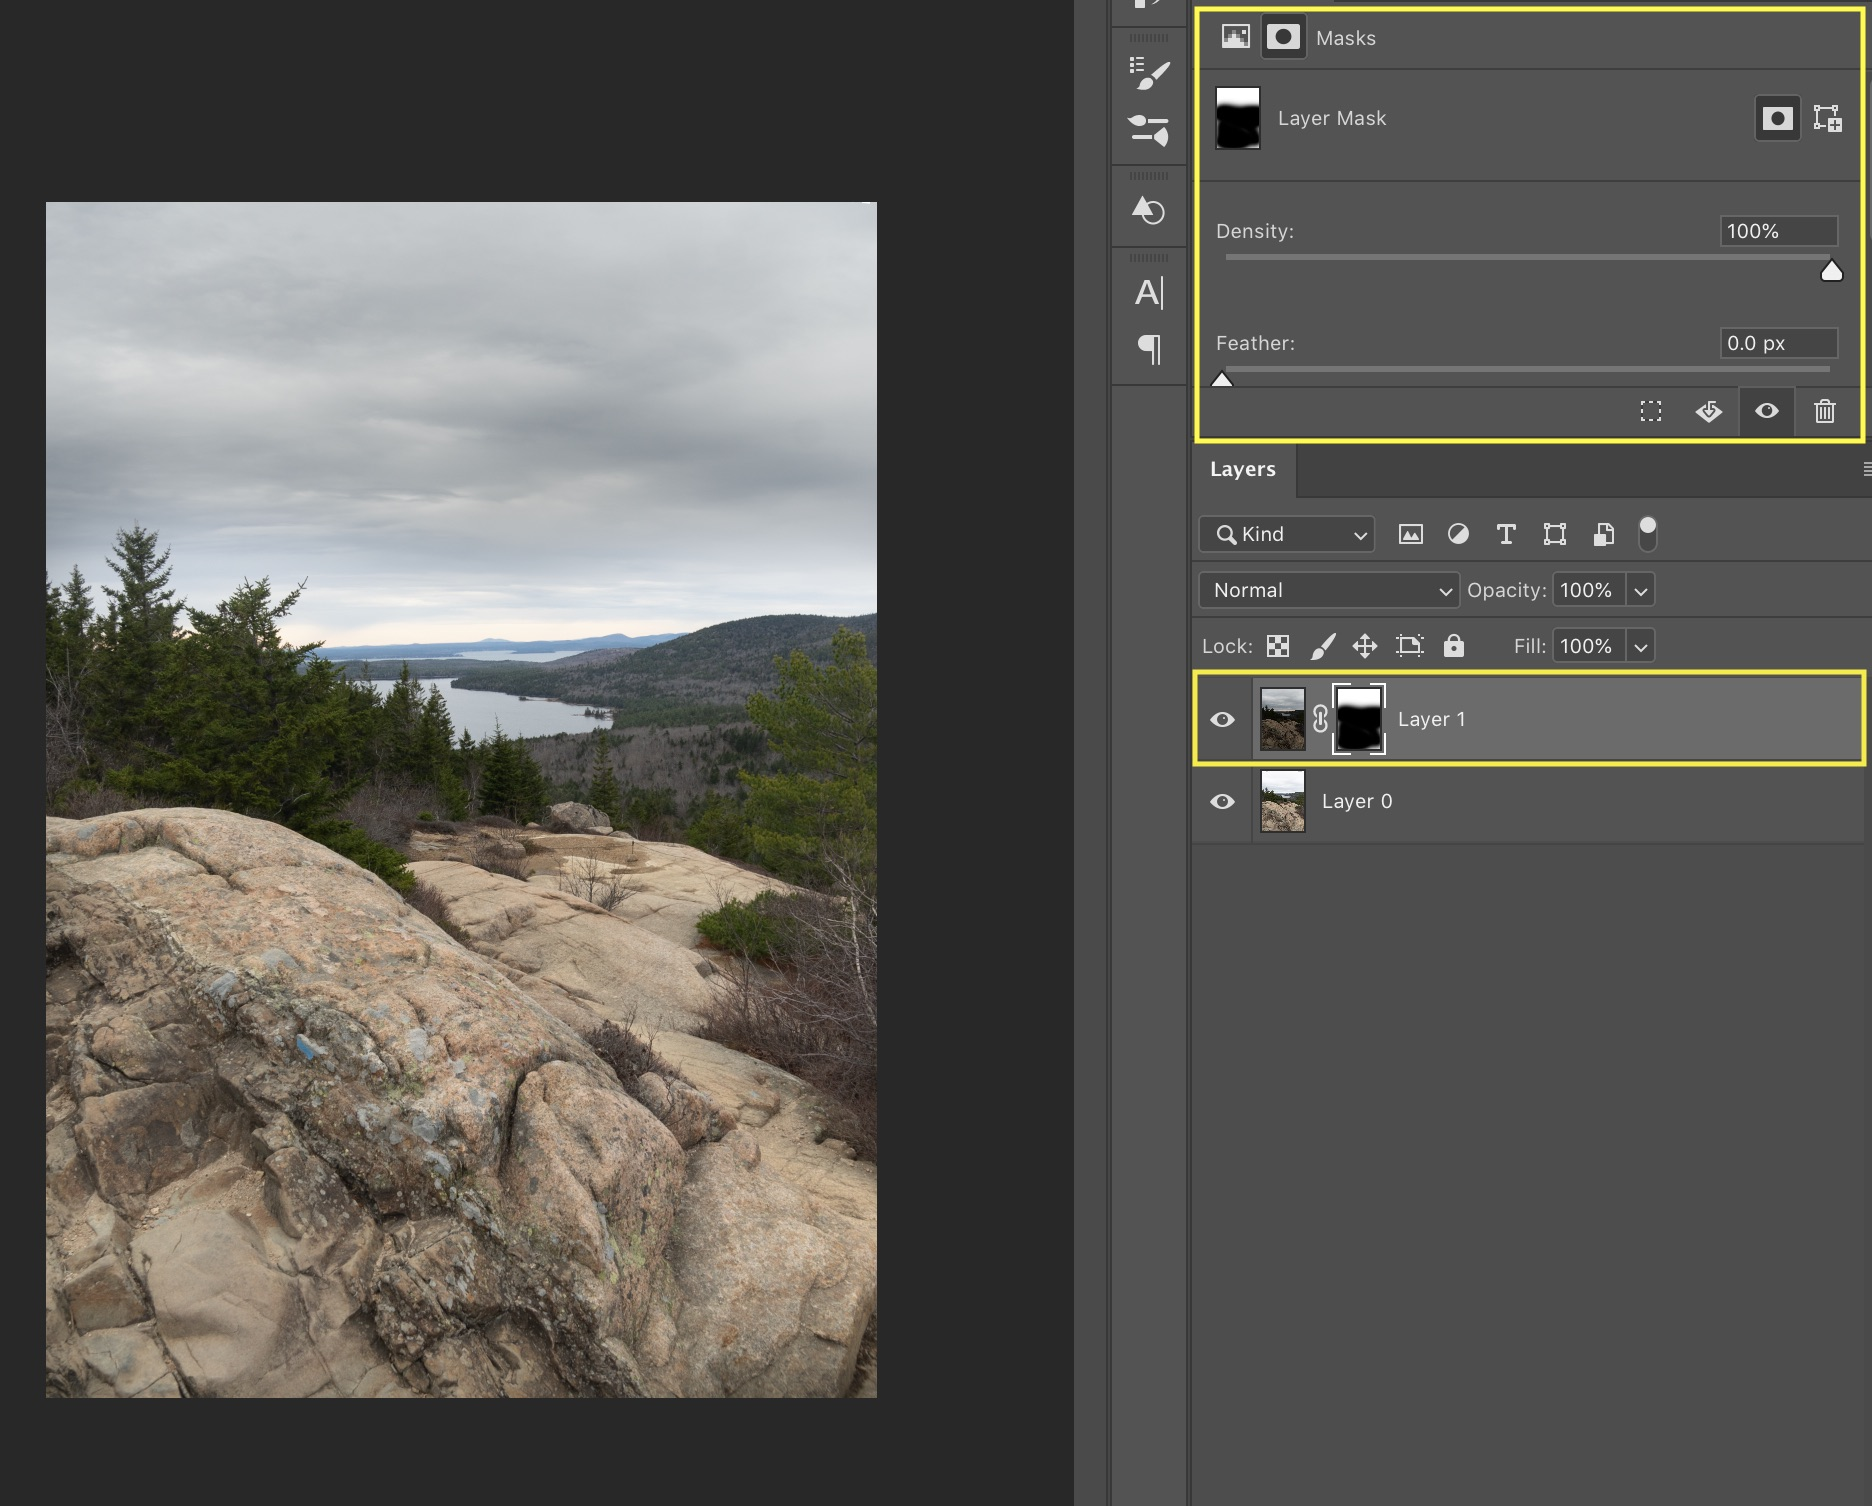 masking image layer